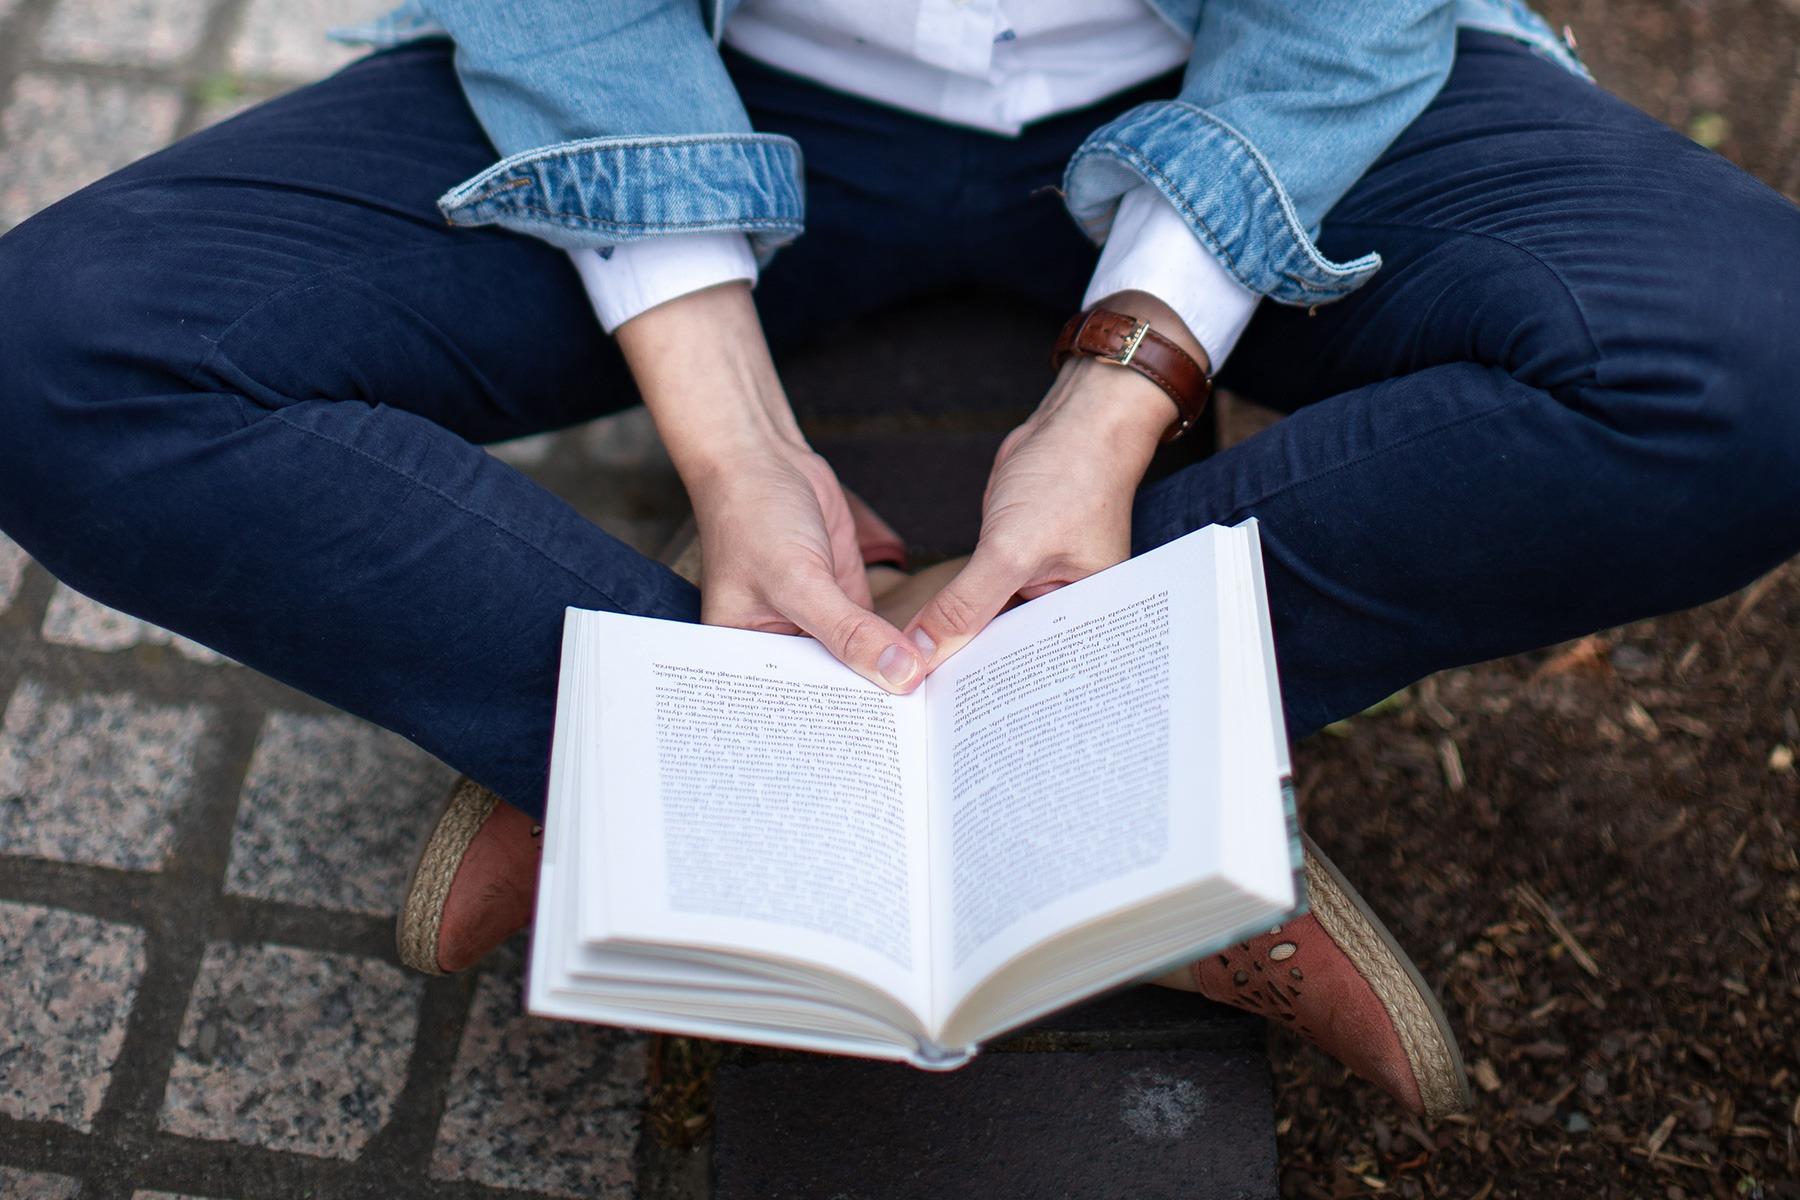 Anna Matecka Polish Teacher reading book - Personal Branding photoshoot in London